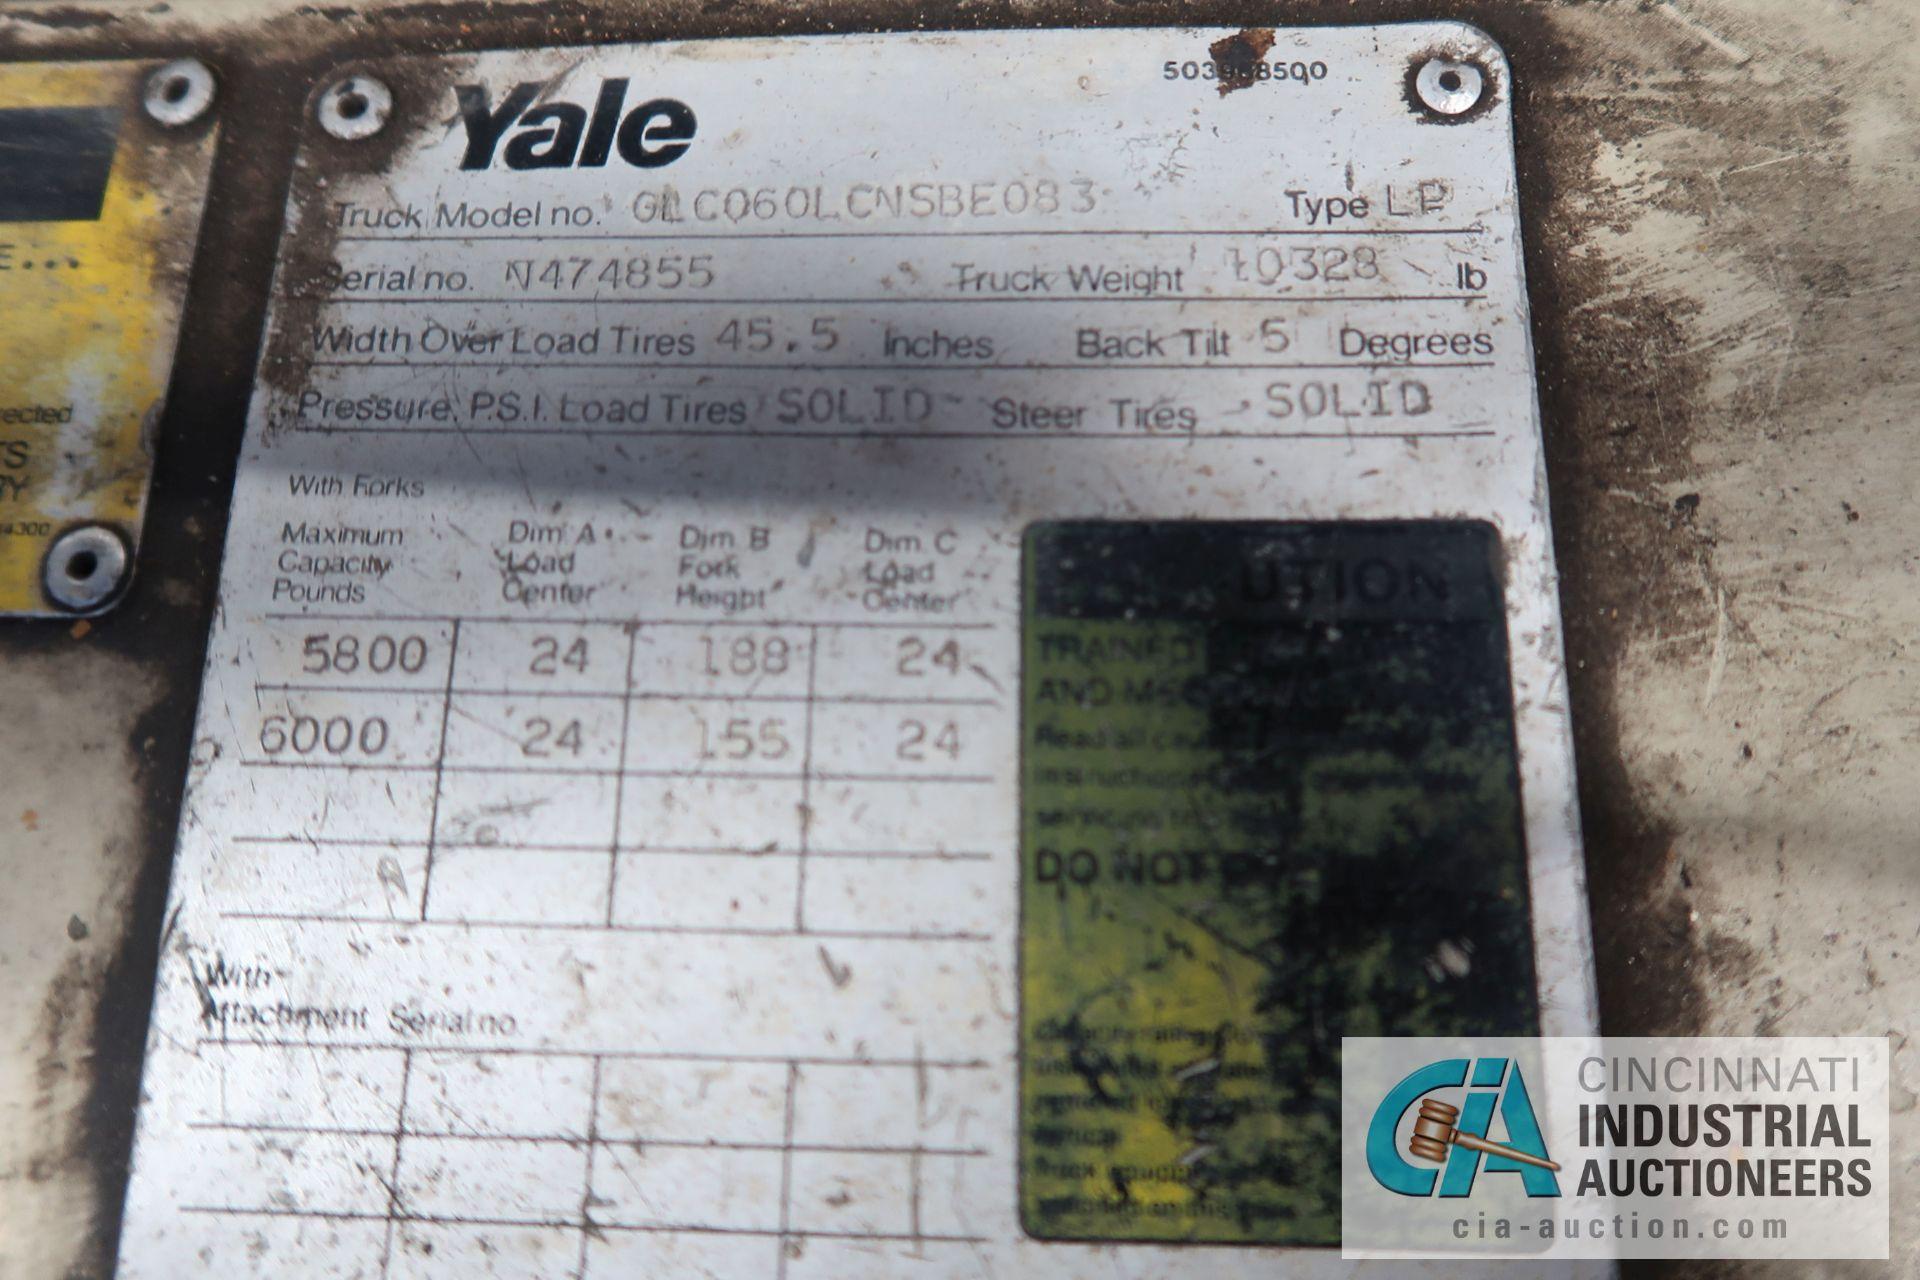 6,000 LB. YALE MODEL GLC060LCNSBE083 LP GAS SOLID TIRE THREE-STAGE MAST LIFT TRUCK; S/N N474855, - Image 7 of 7